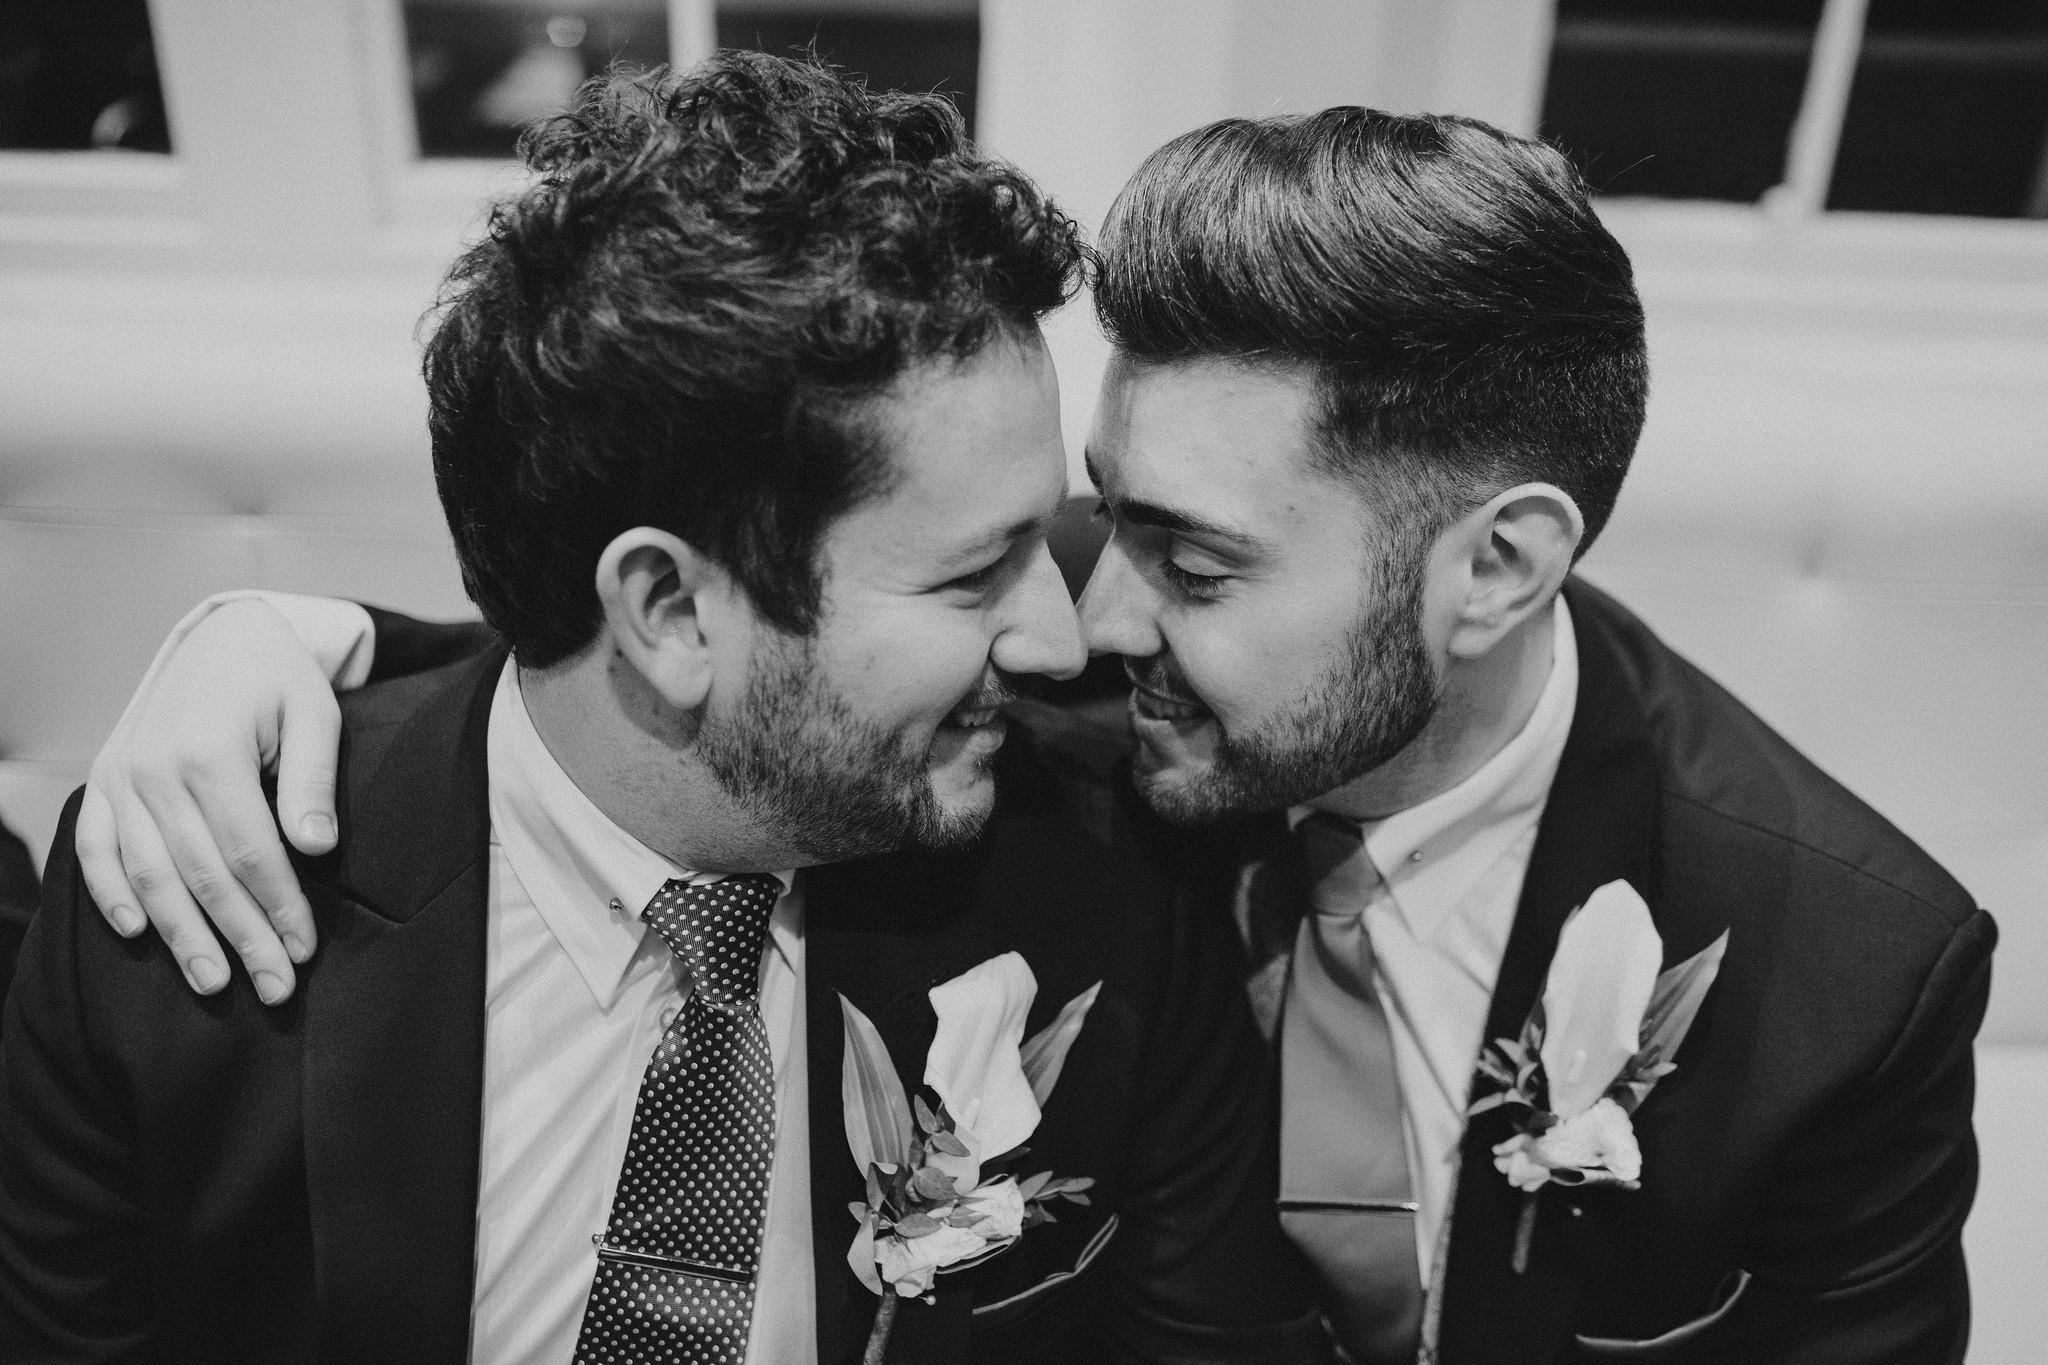 "<p>Фото &copy; <a href=""https://www.flickr.com/photos/blavoulondon/25397269264/"" target=""_blank"">Flickr/Blavou - Wedding Photography</a></p>"